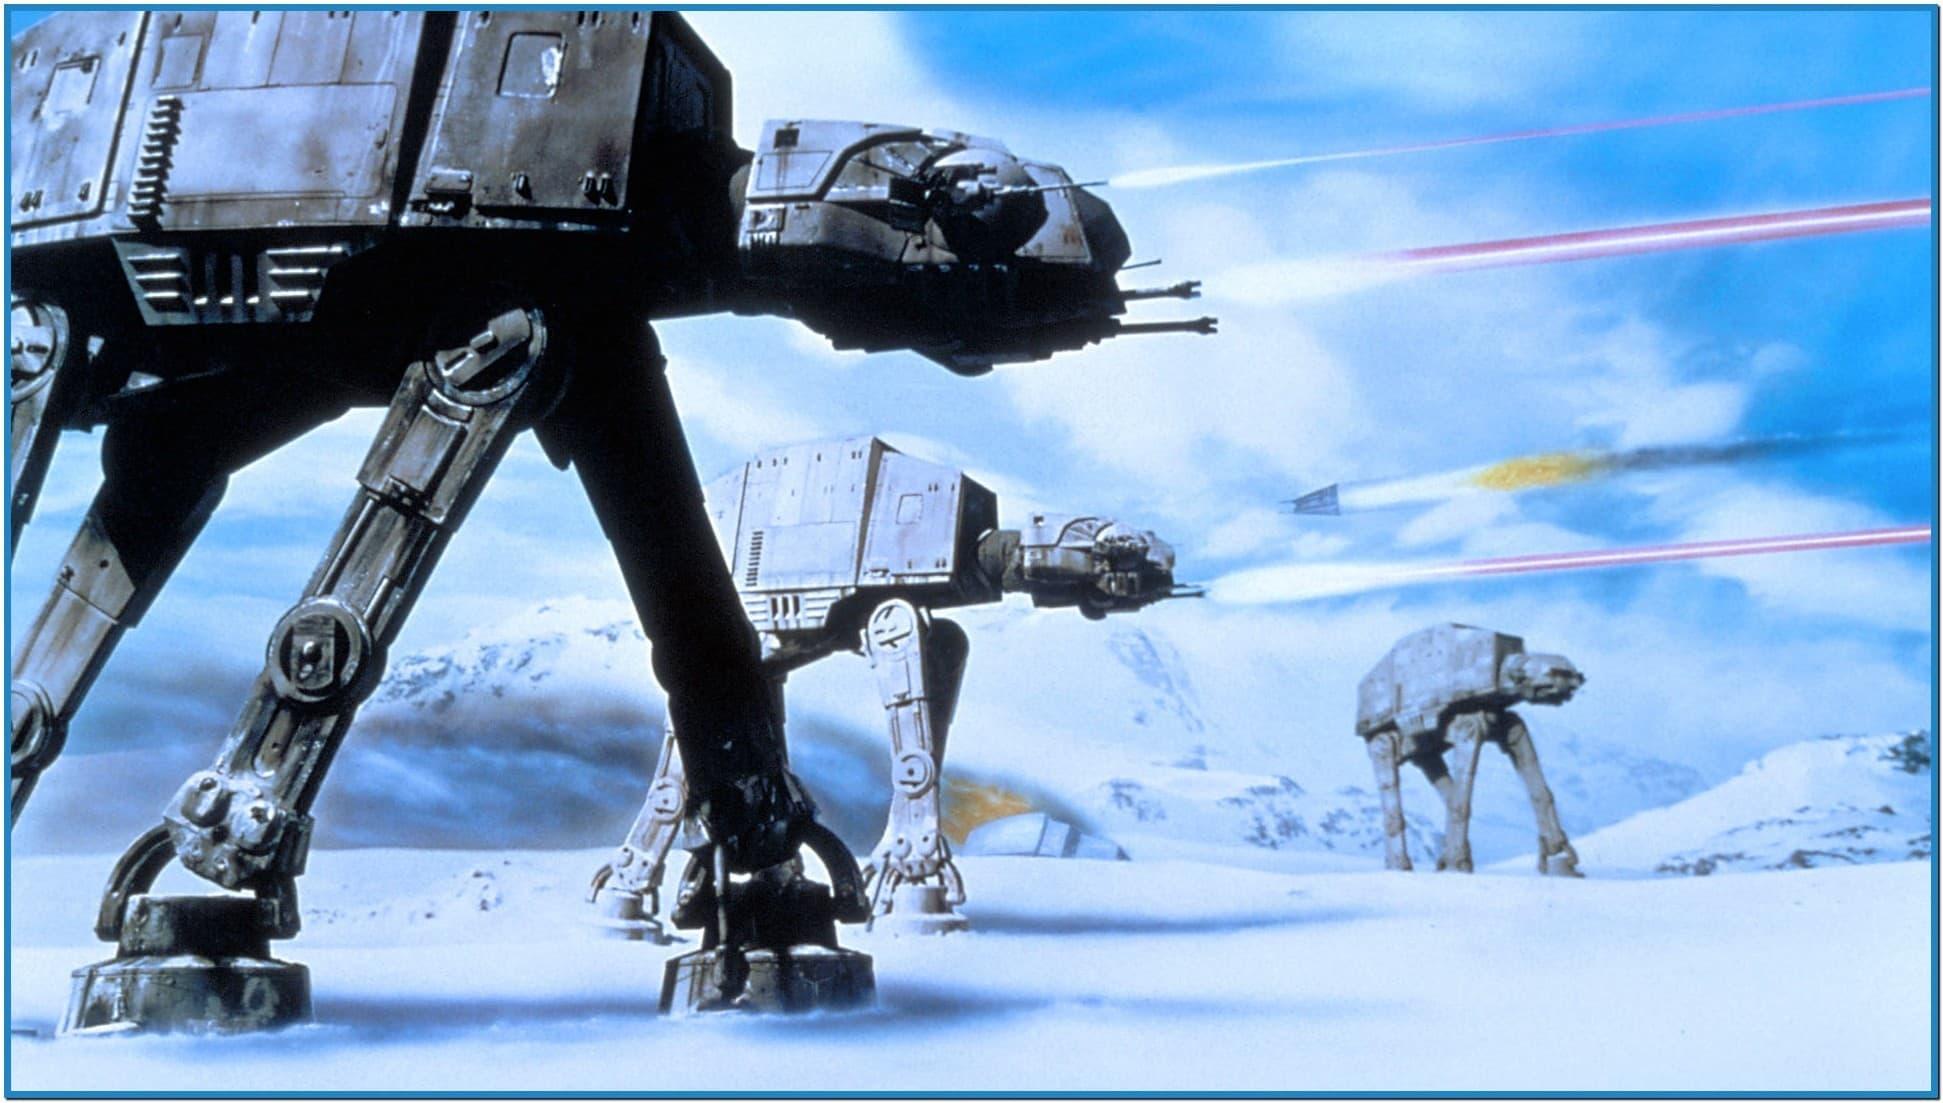 Star wars screensaver battle   Download 1943x1103